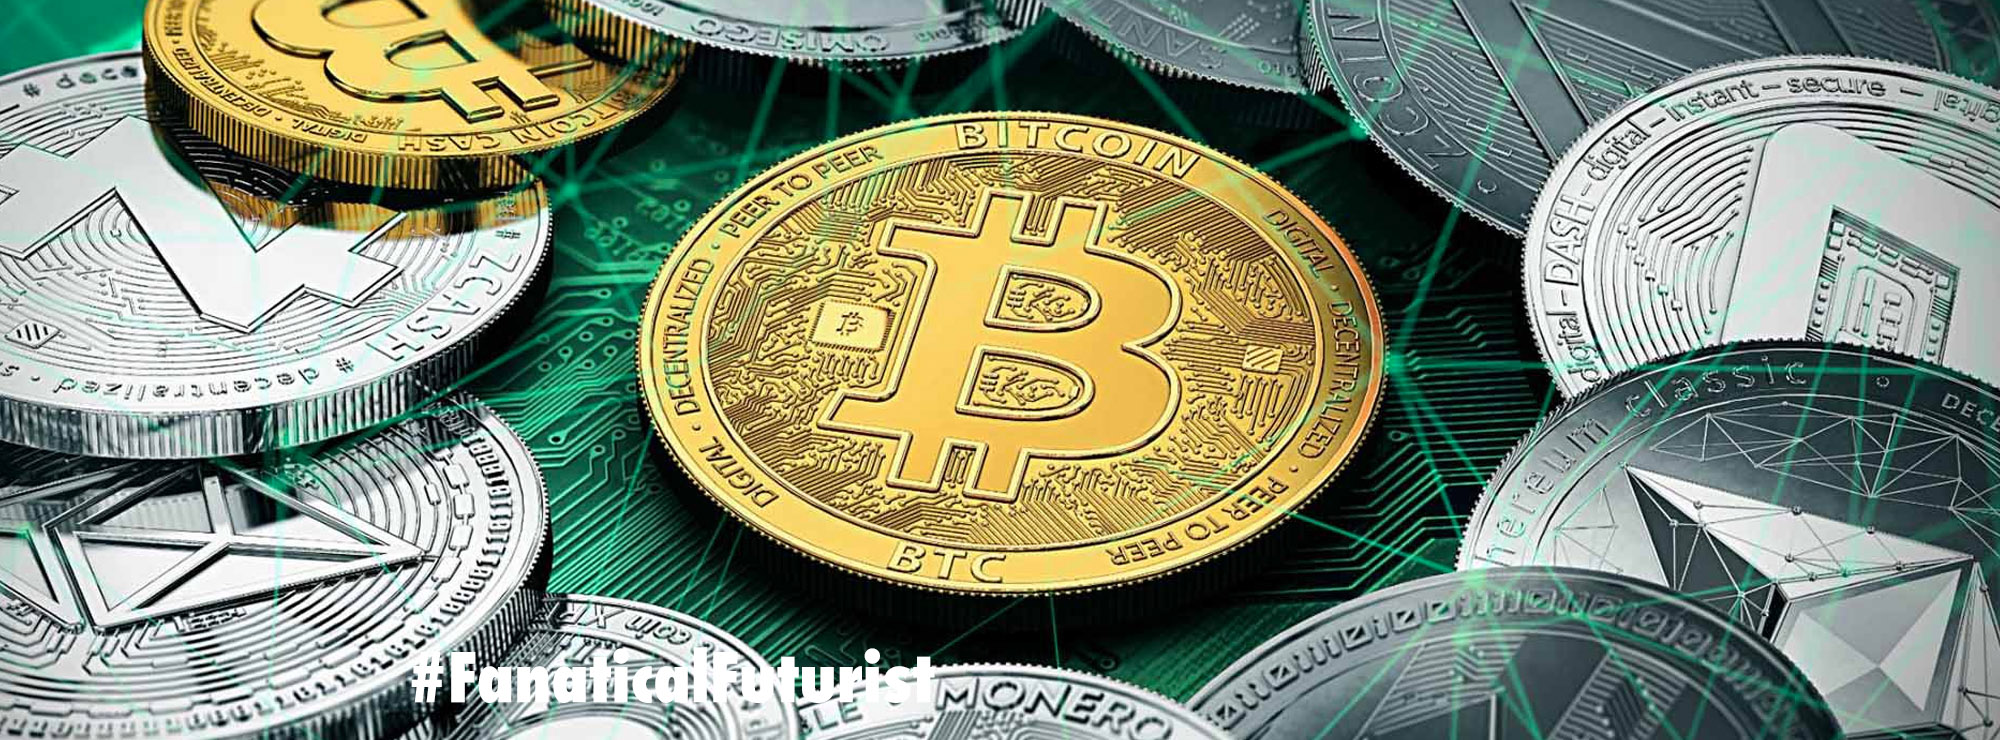 coin basis